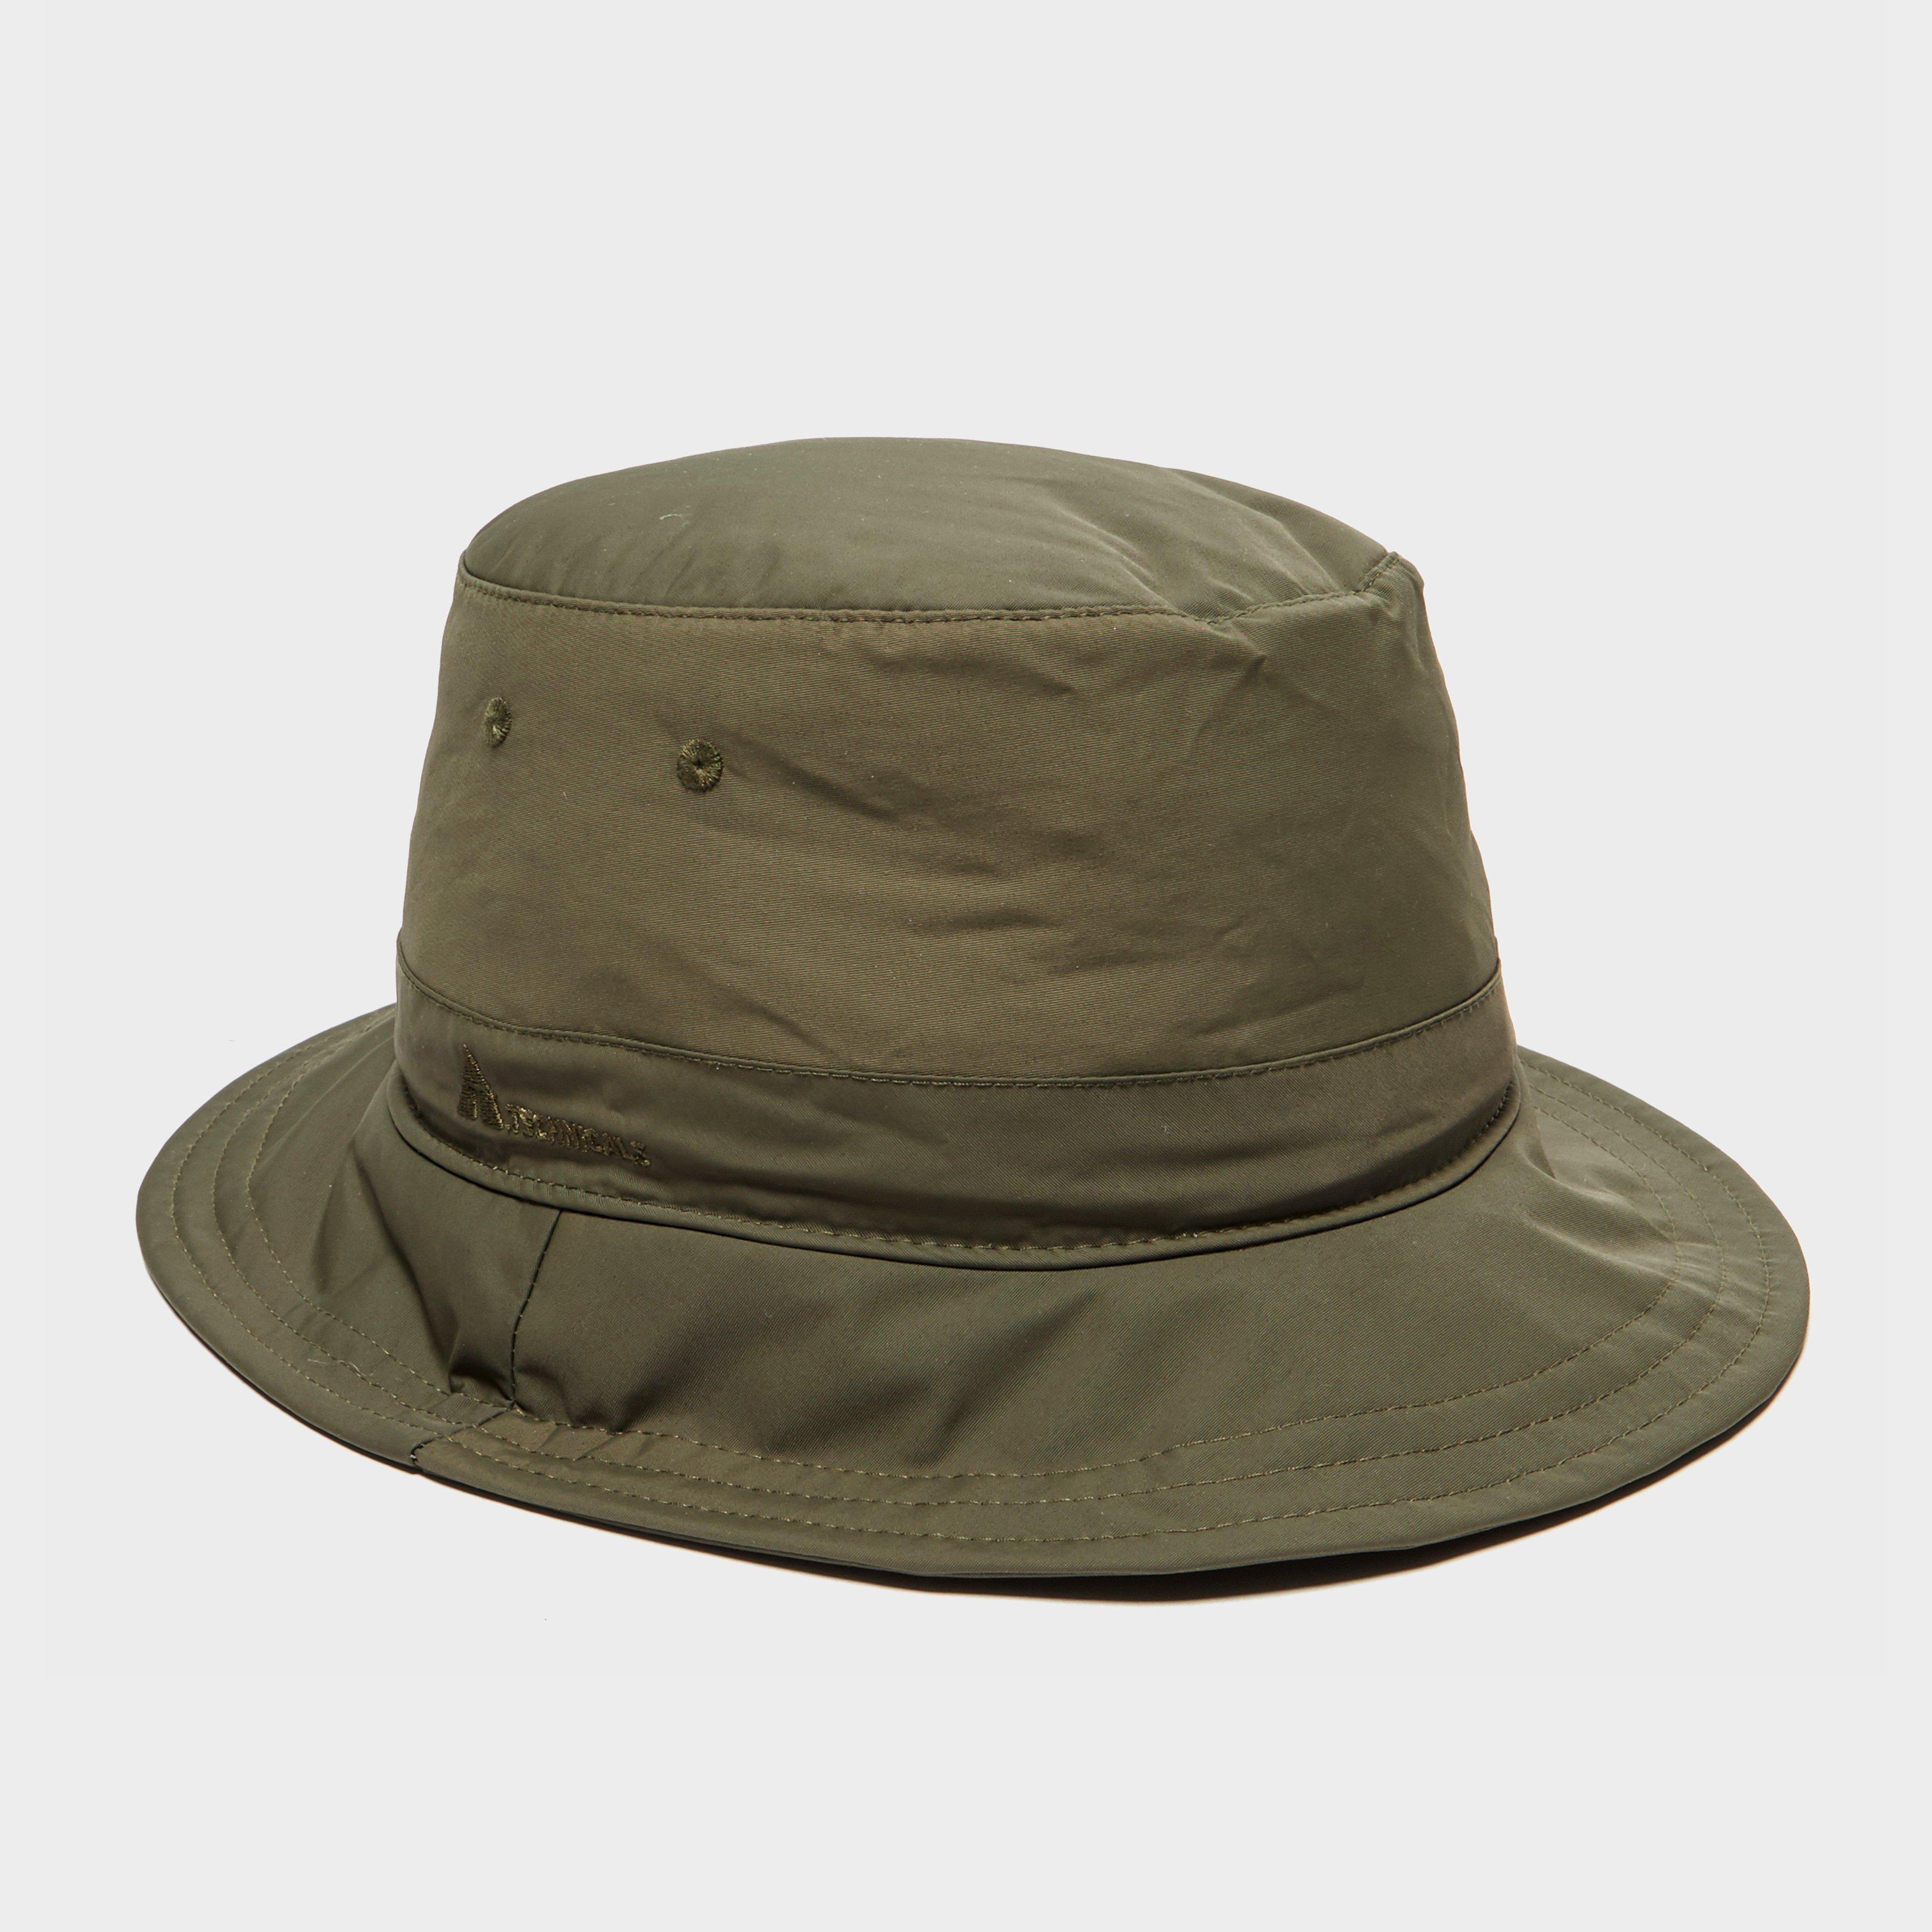 Technicals Unisex Bucket Hat - Khaki/khaki  Khaki/khaki